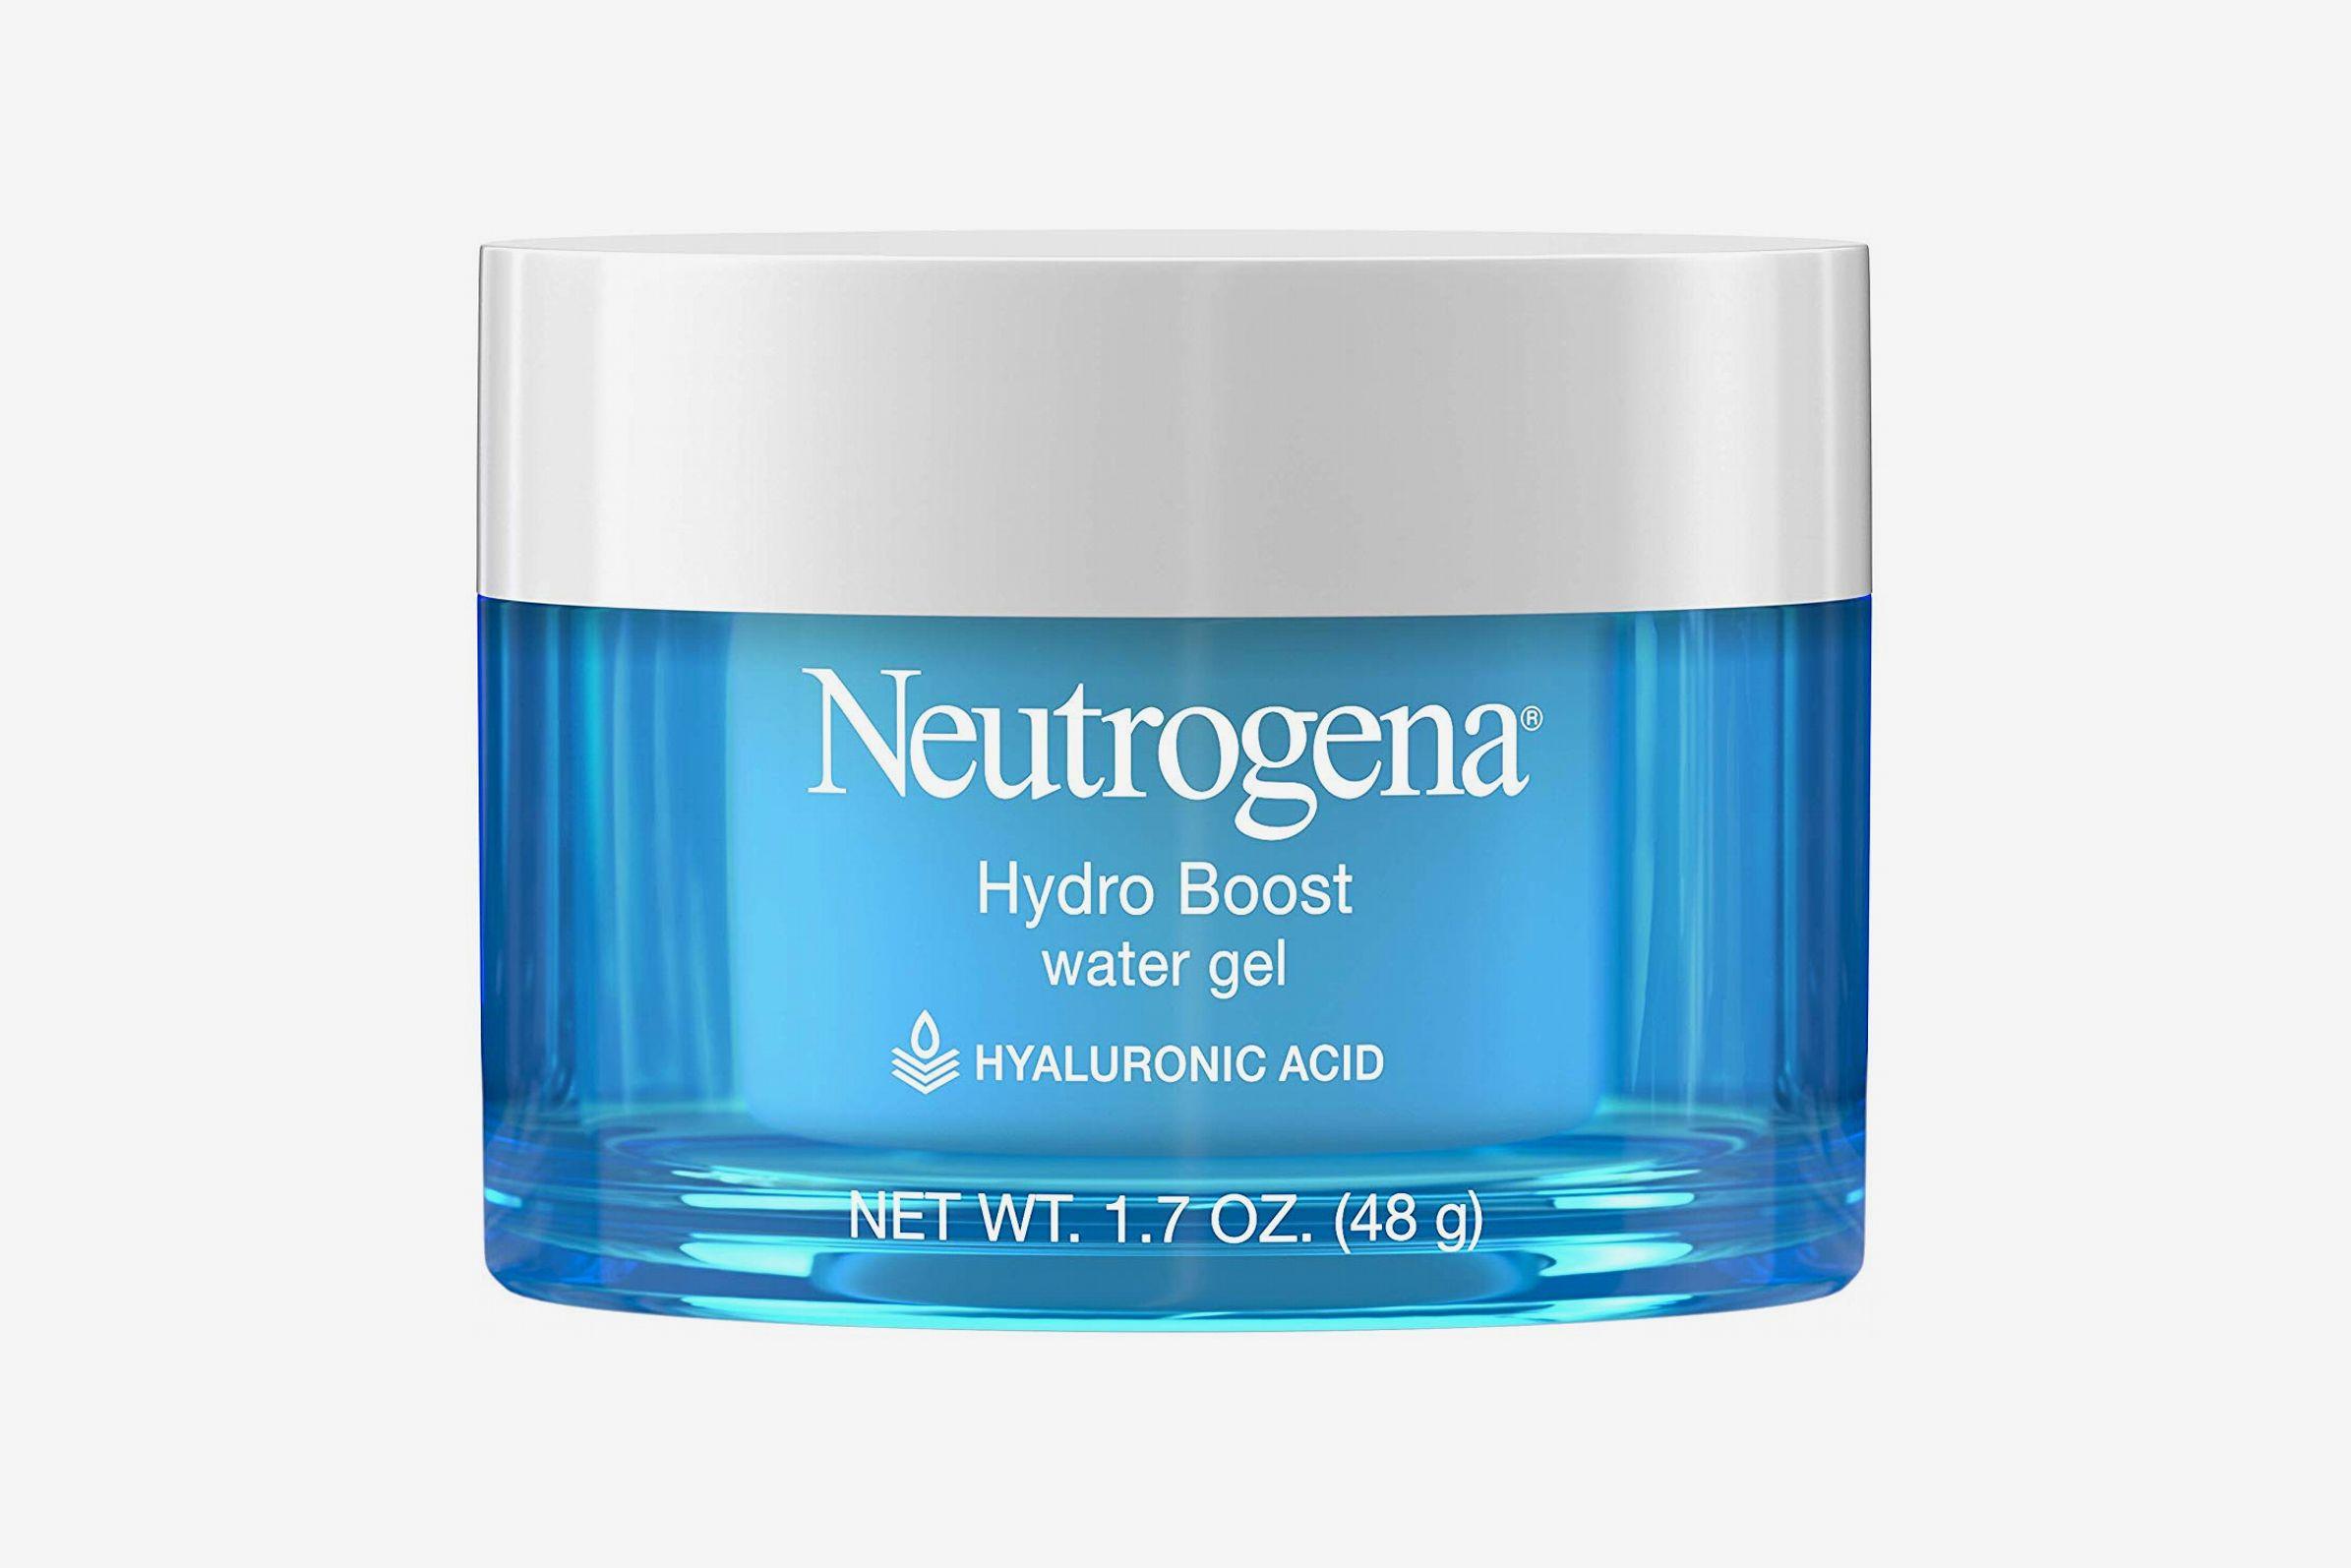 Neutrogena Hydro Boost Hyaluronic Acid Hydrating Water Face Gel Moisturizer for Dry Skin